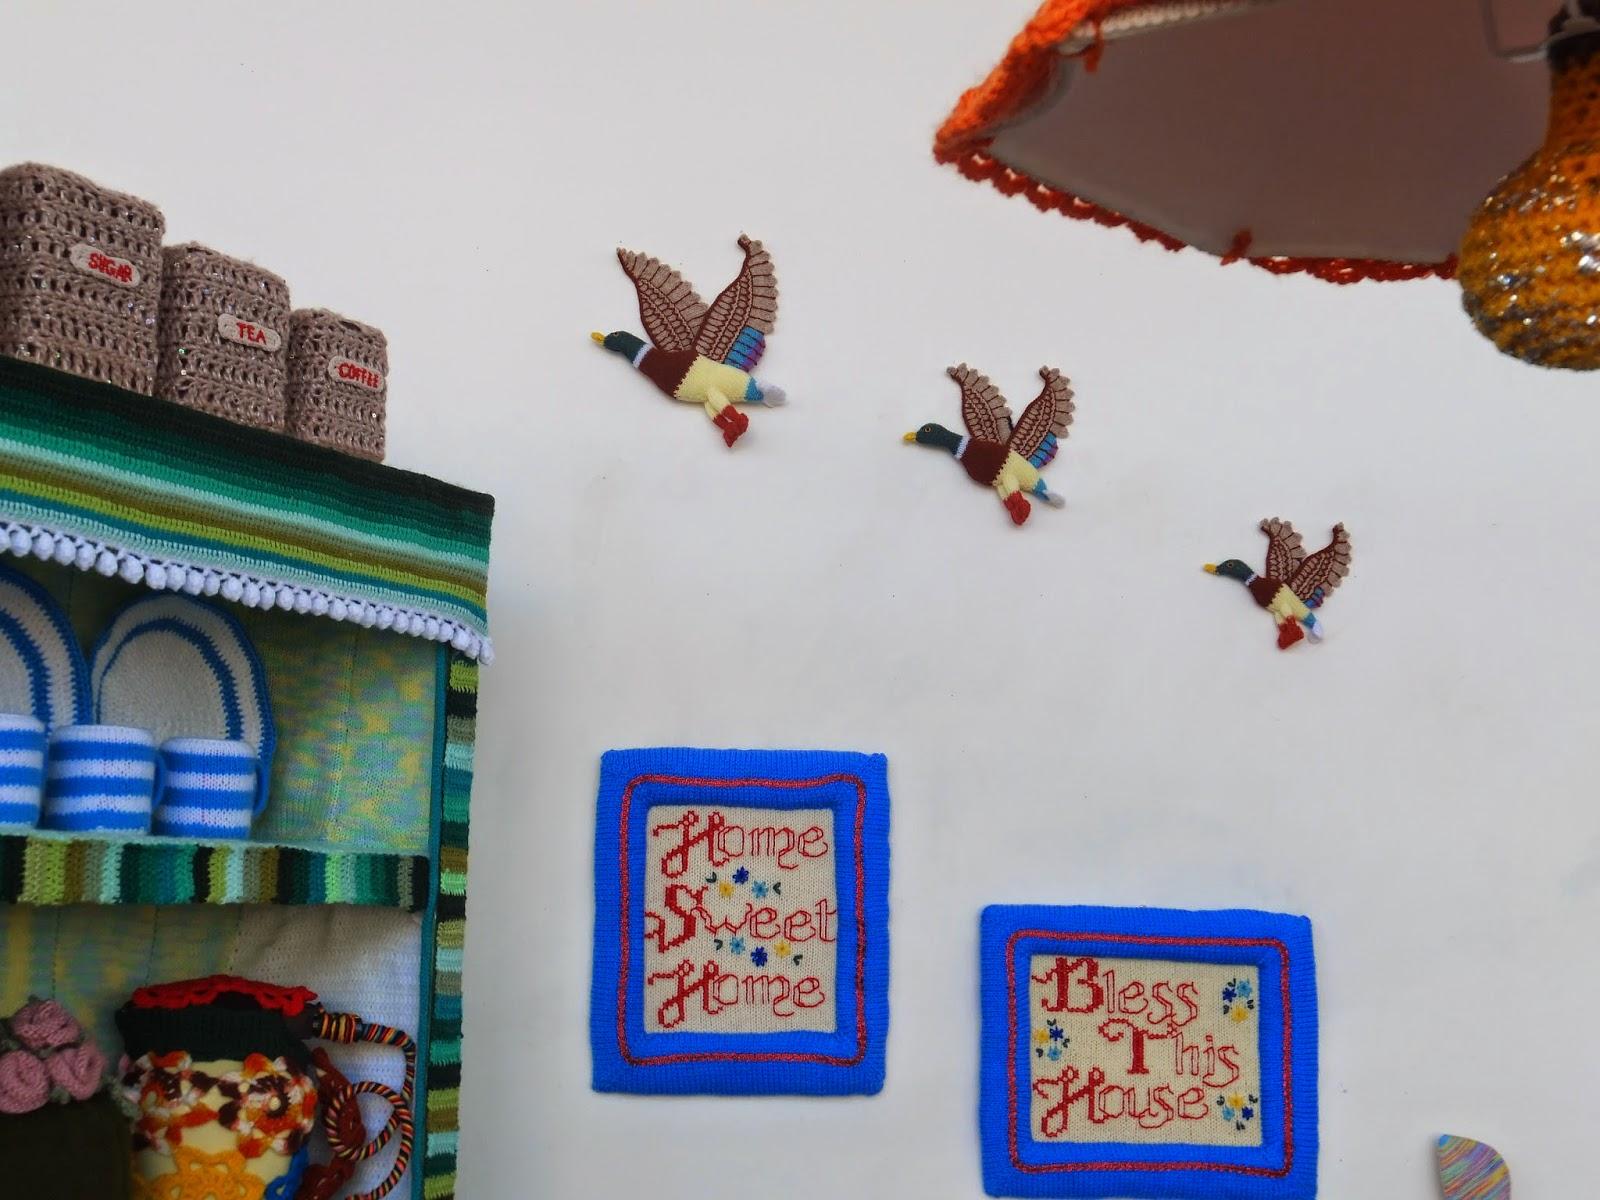 yarn-bombing-warwick-art-gallery-07